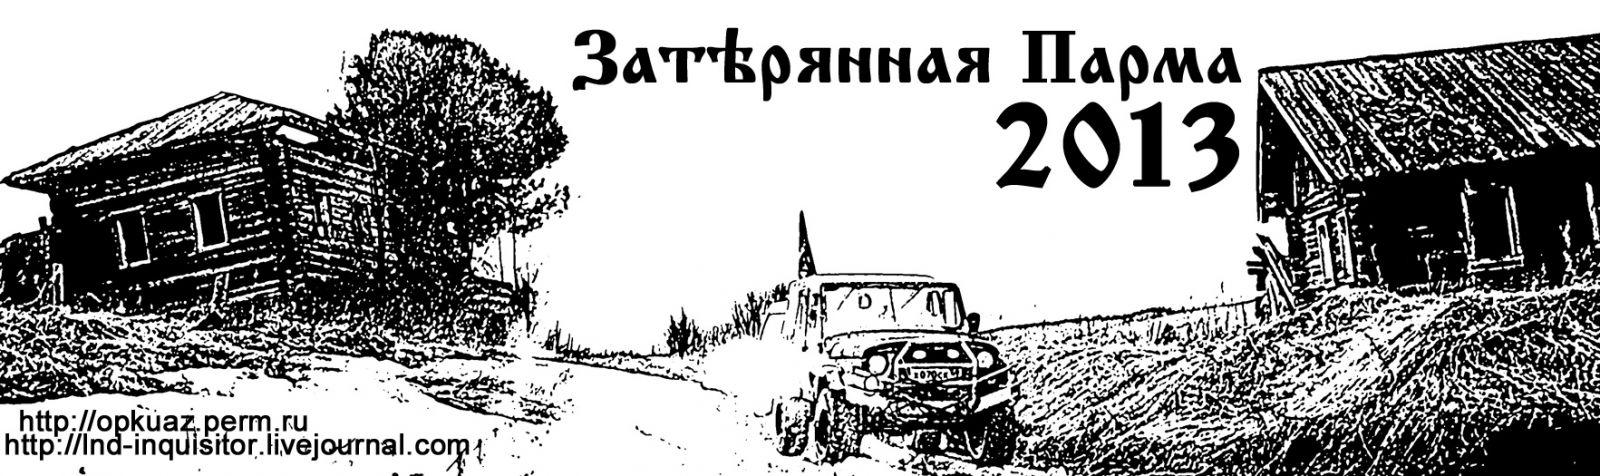 logo3small2